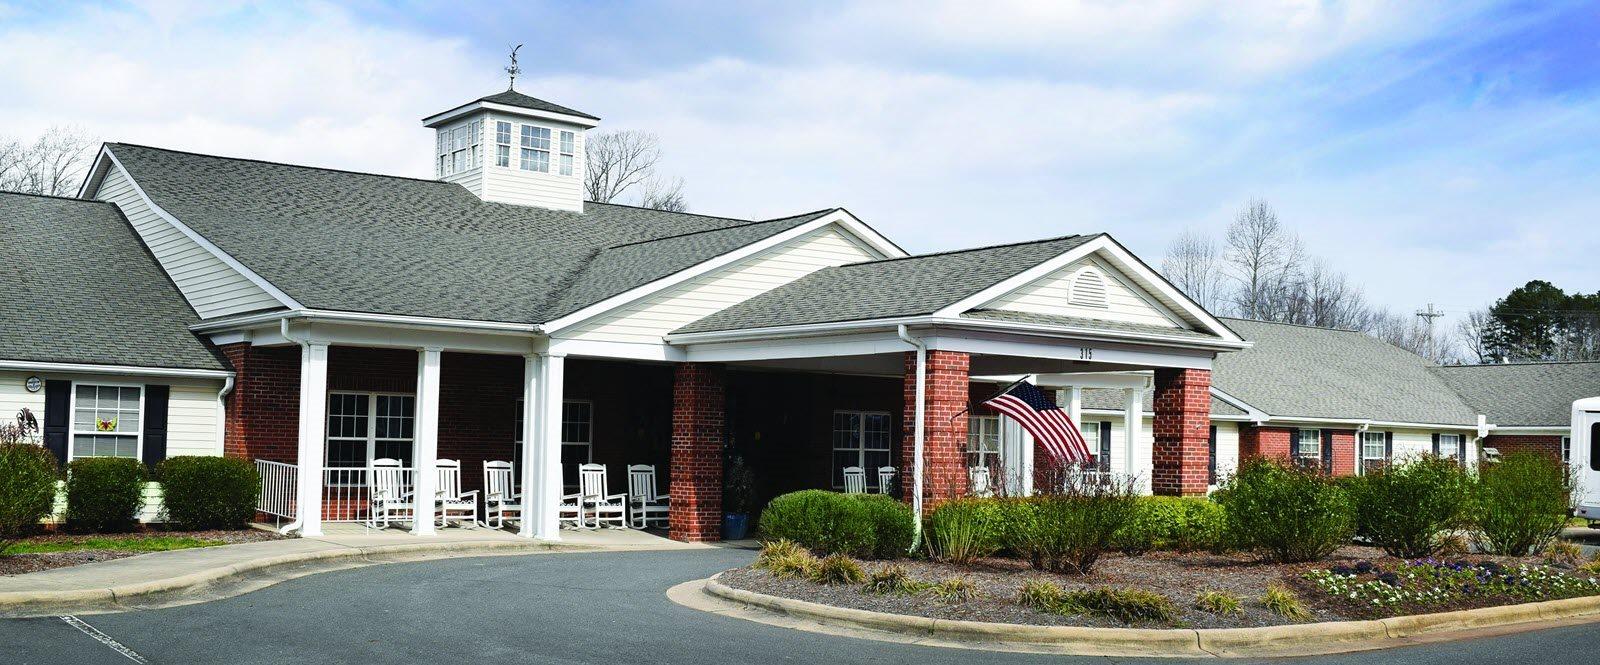 Apartment Community Entrance at Spring Arbor of Albemarle